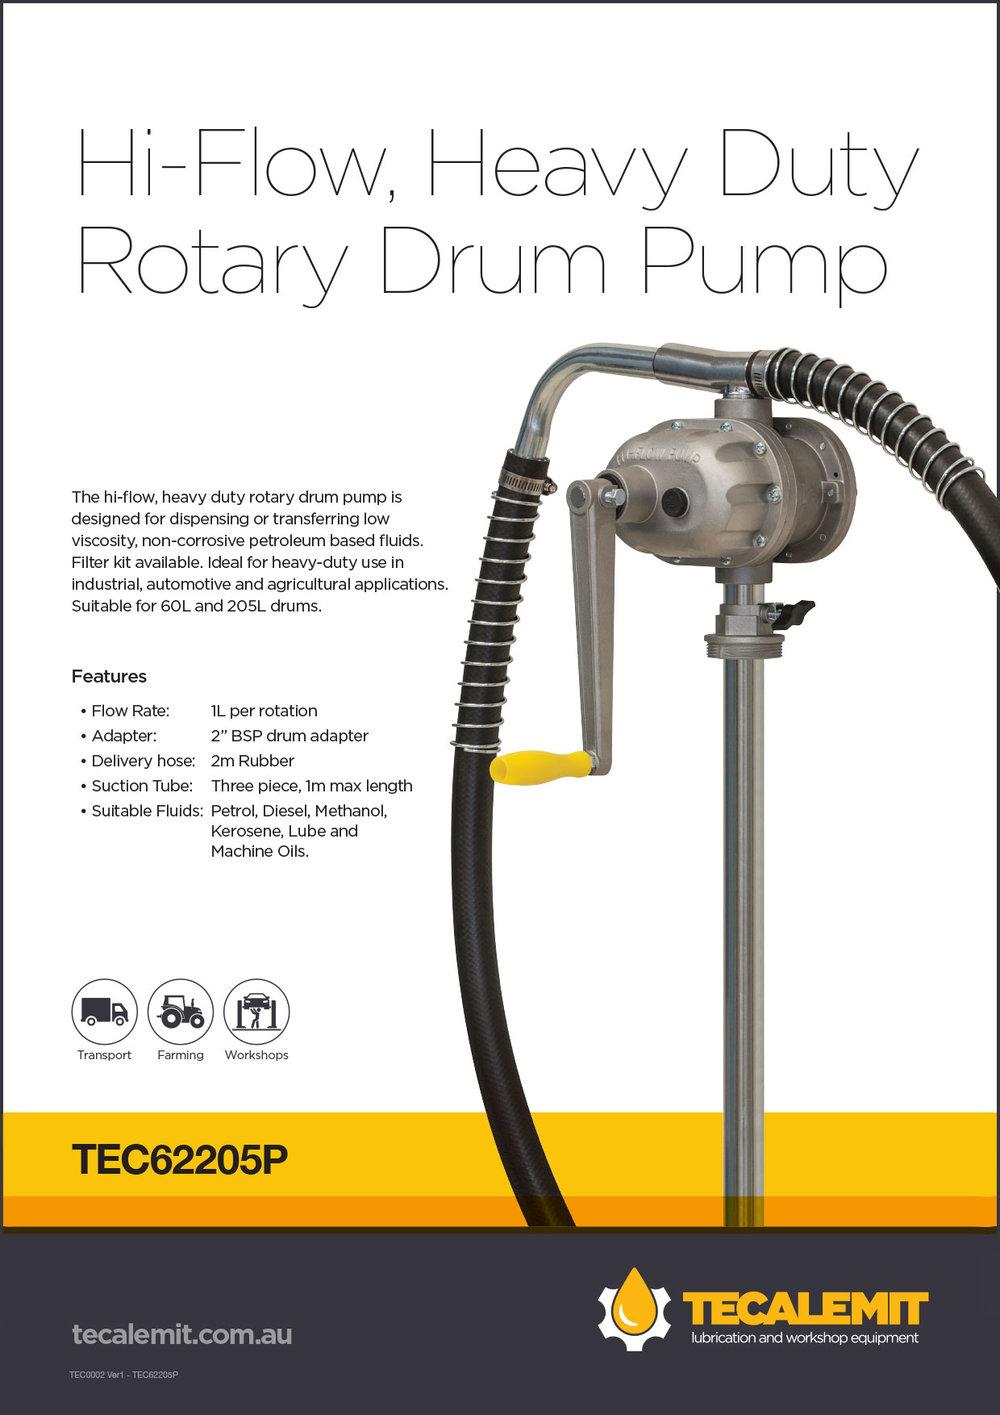 TEC62205P Product Info